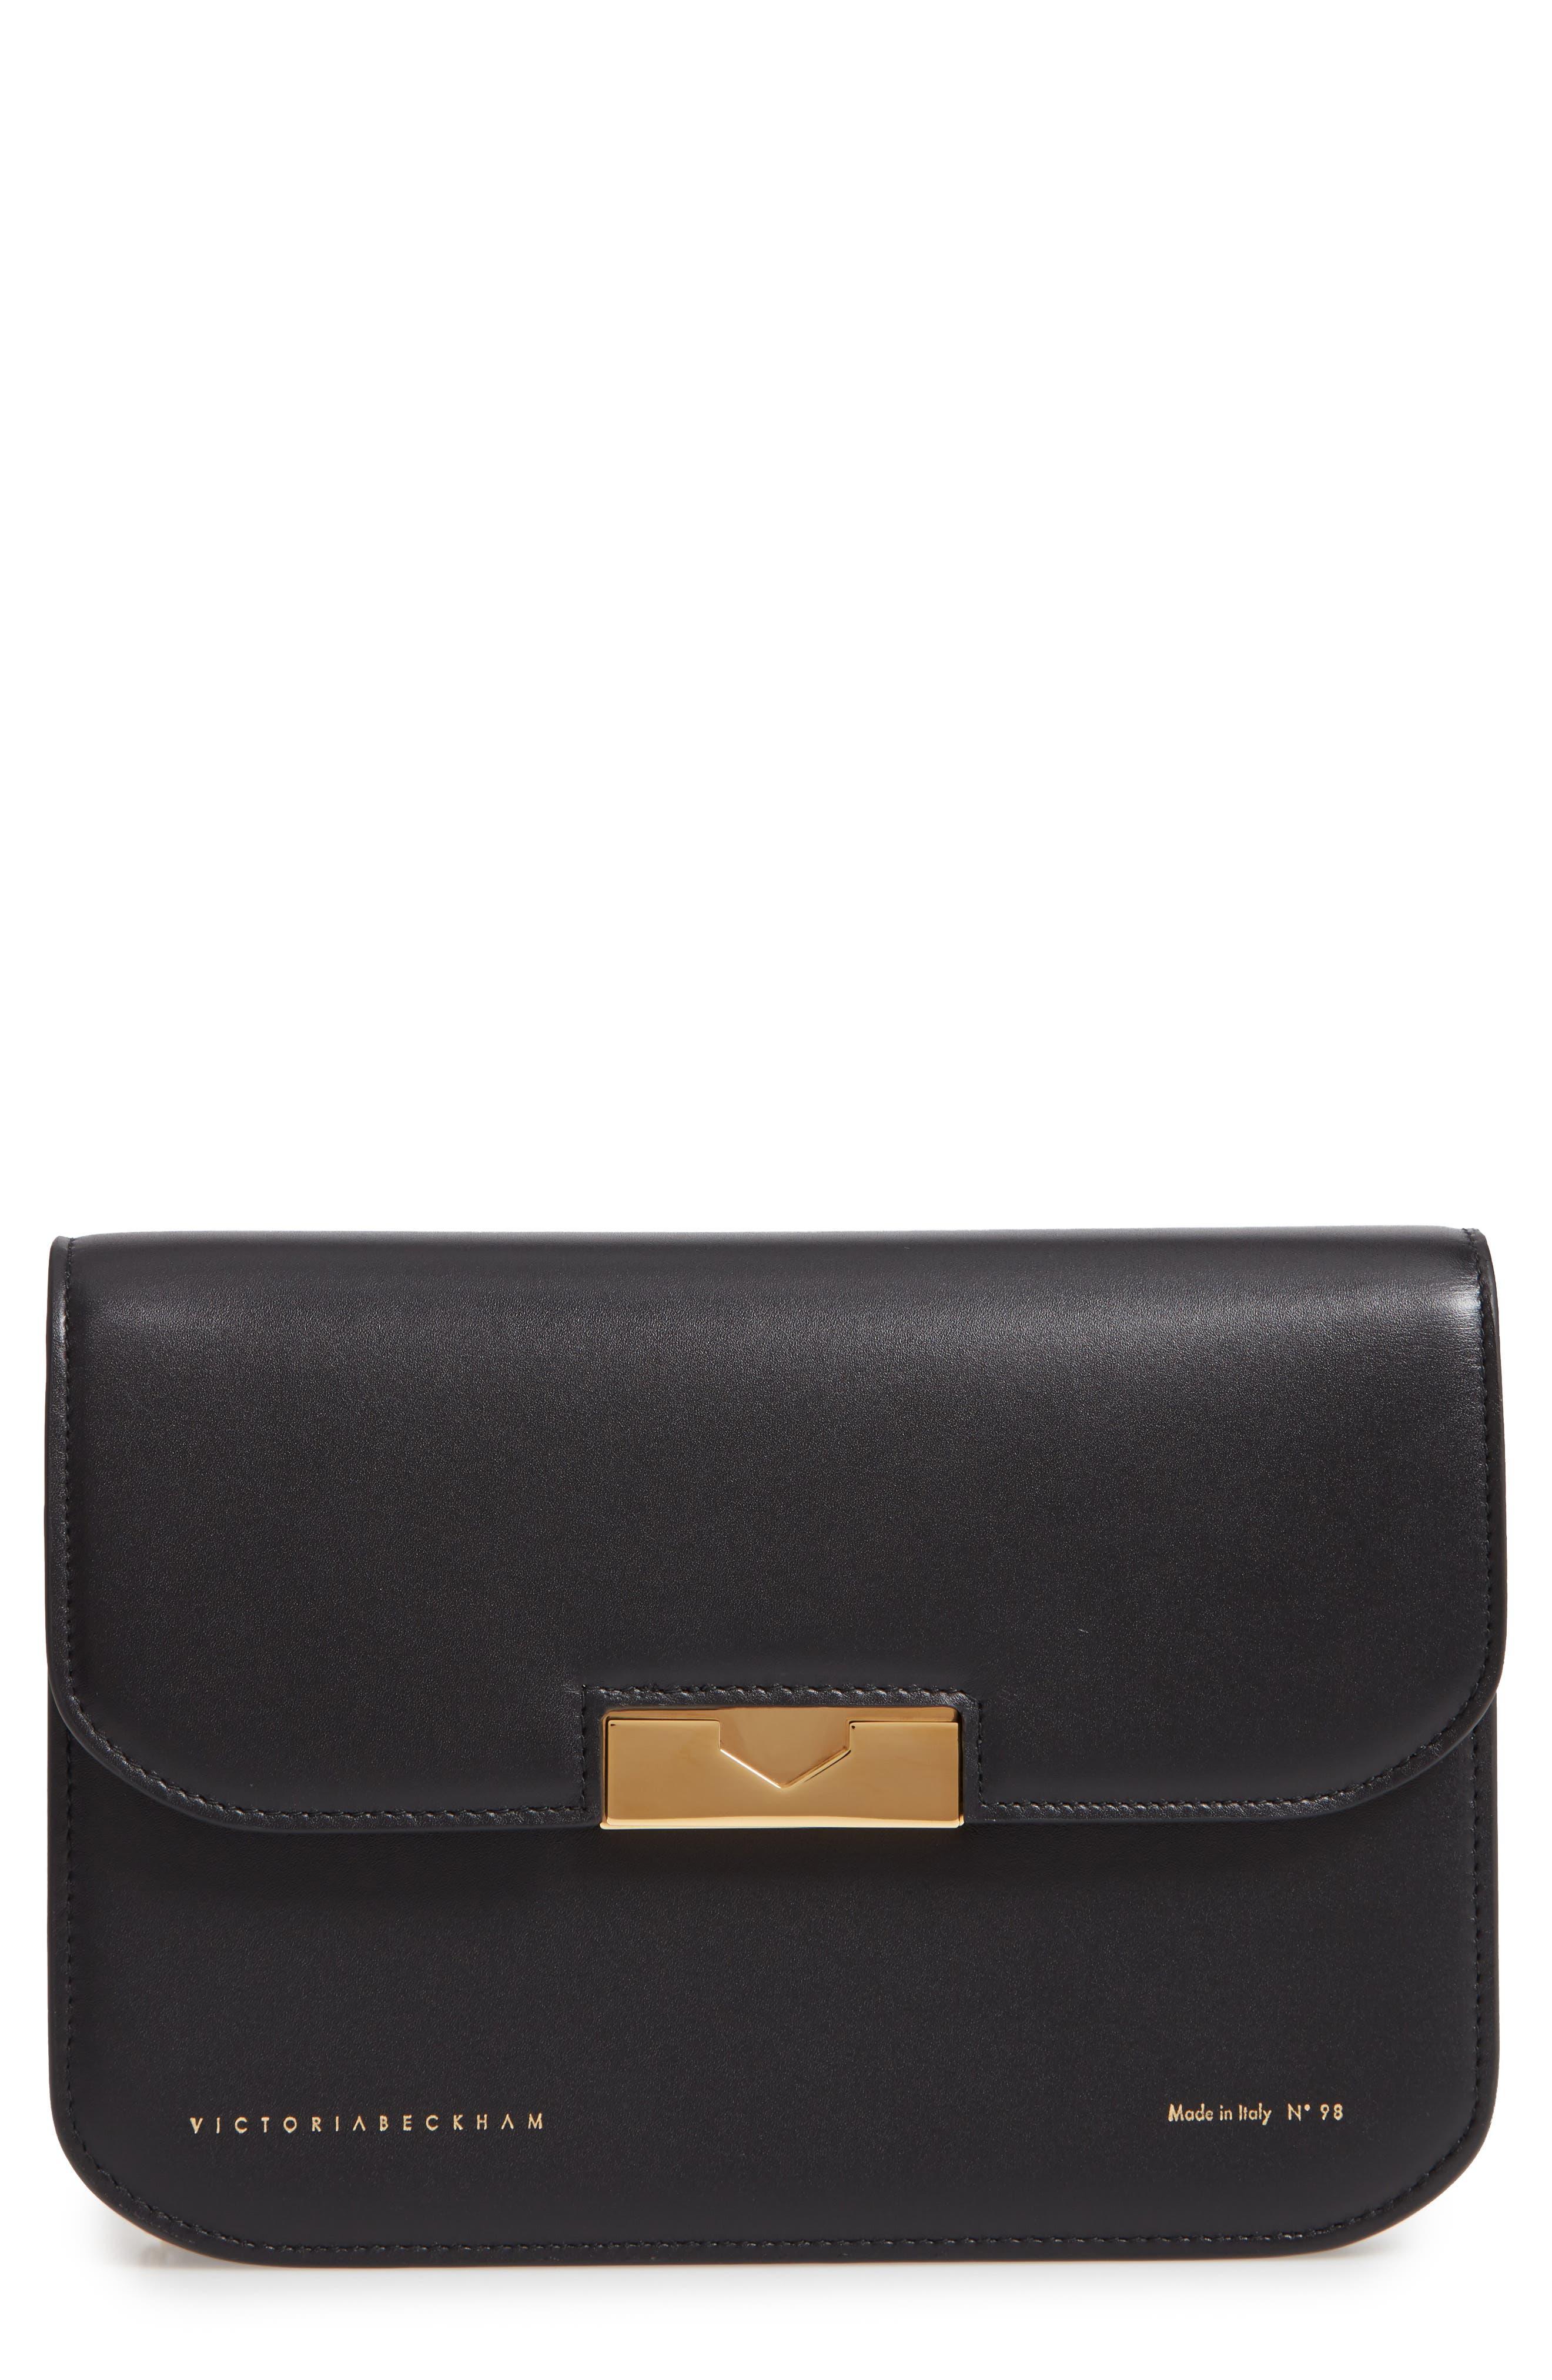 VICTORIA BECKHAM Eva Leather Clutch, Main, color, BLACK